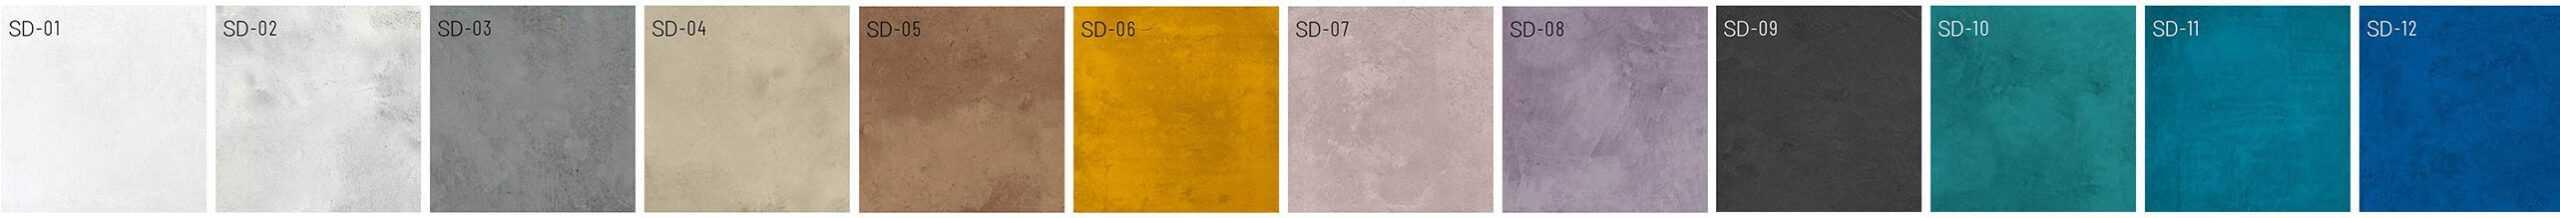 Microzement Farben SD